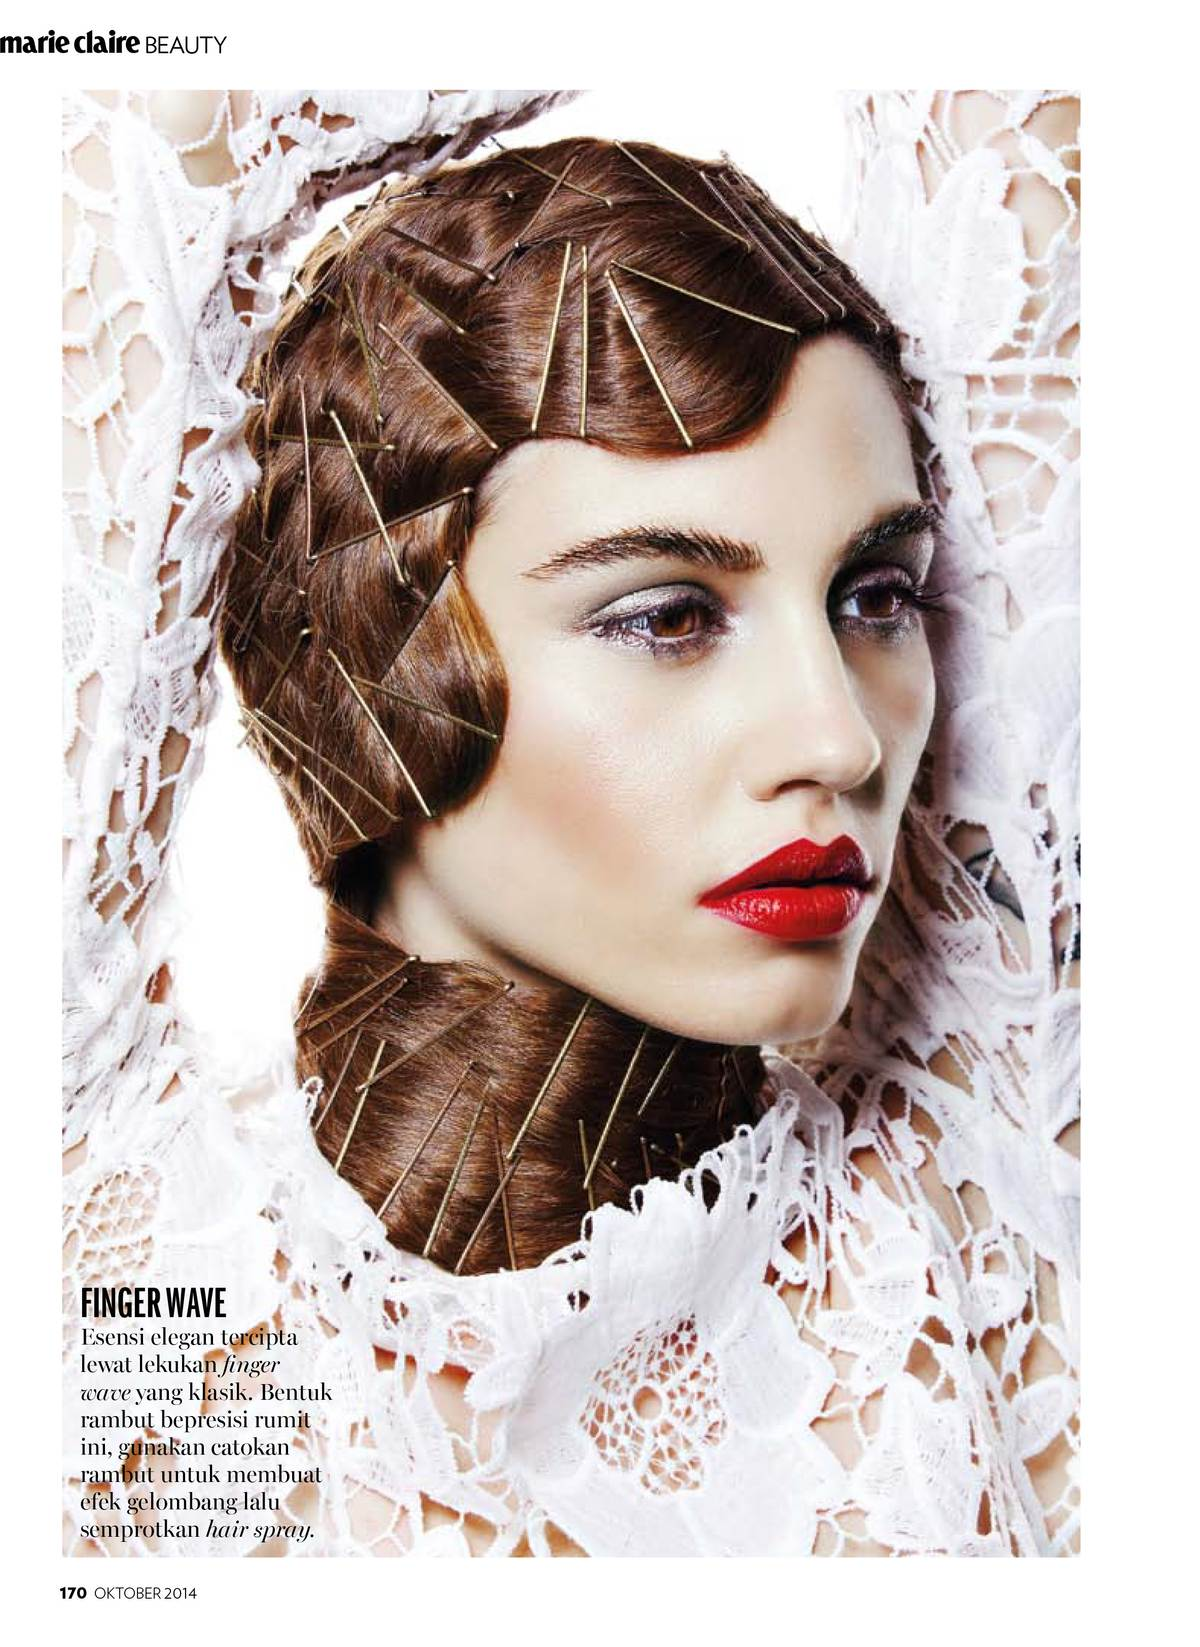 HAIR BEAUTY -  MARIE CLAIRE